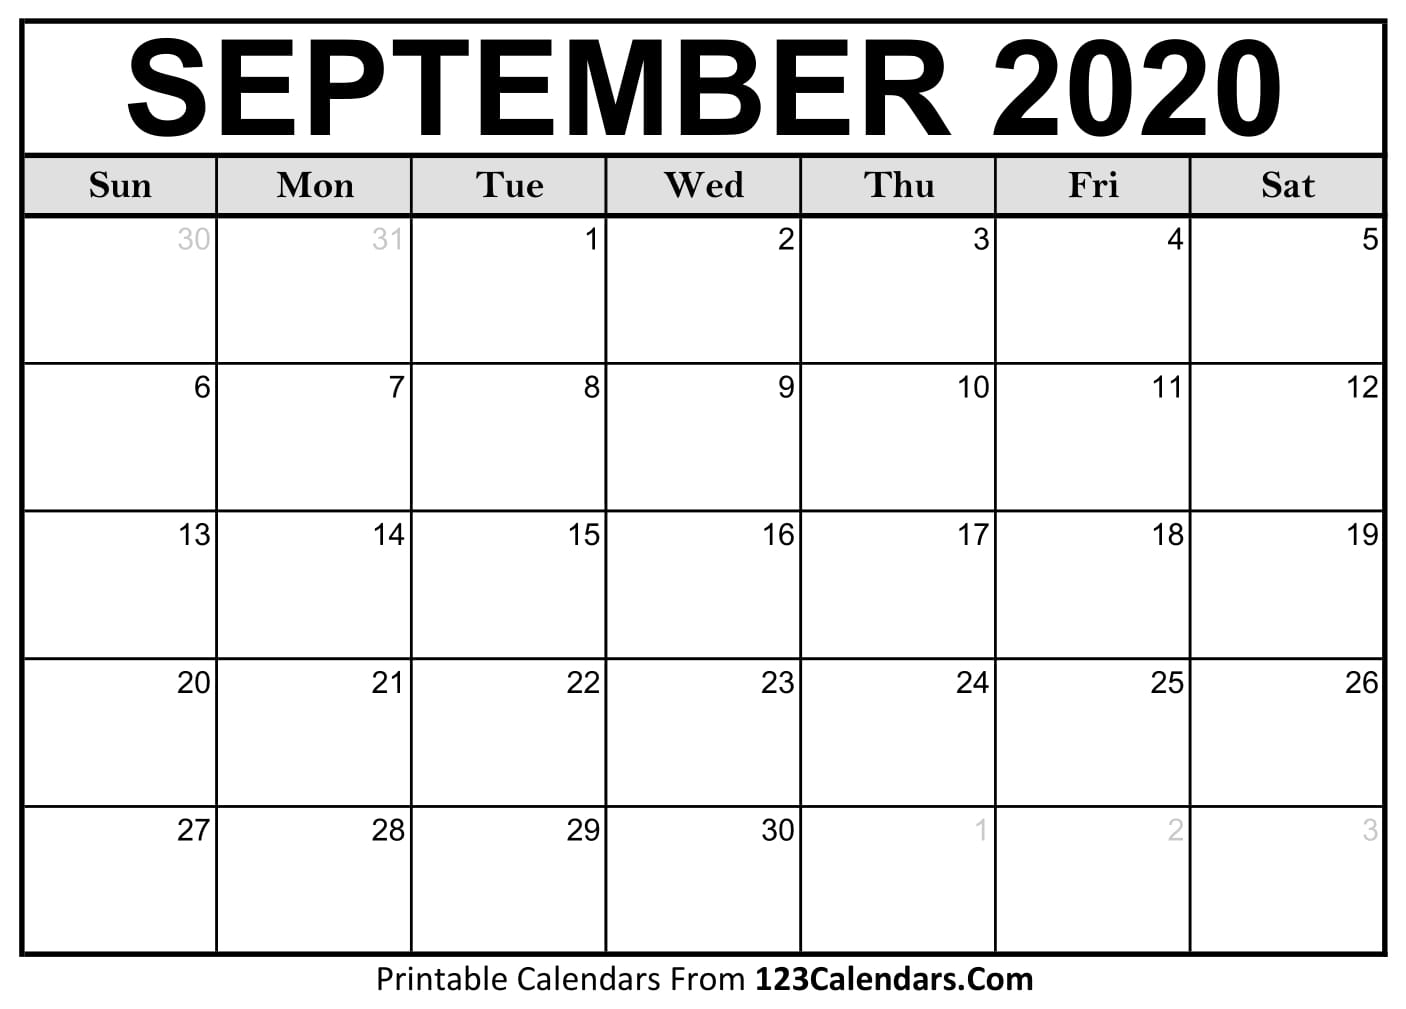 September 2020 Printable Calendar | 123Calendars for September Thru December 2020 Calendar